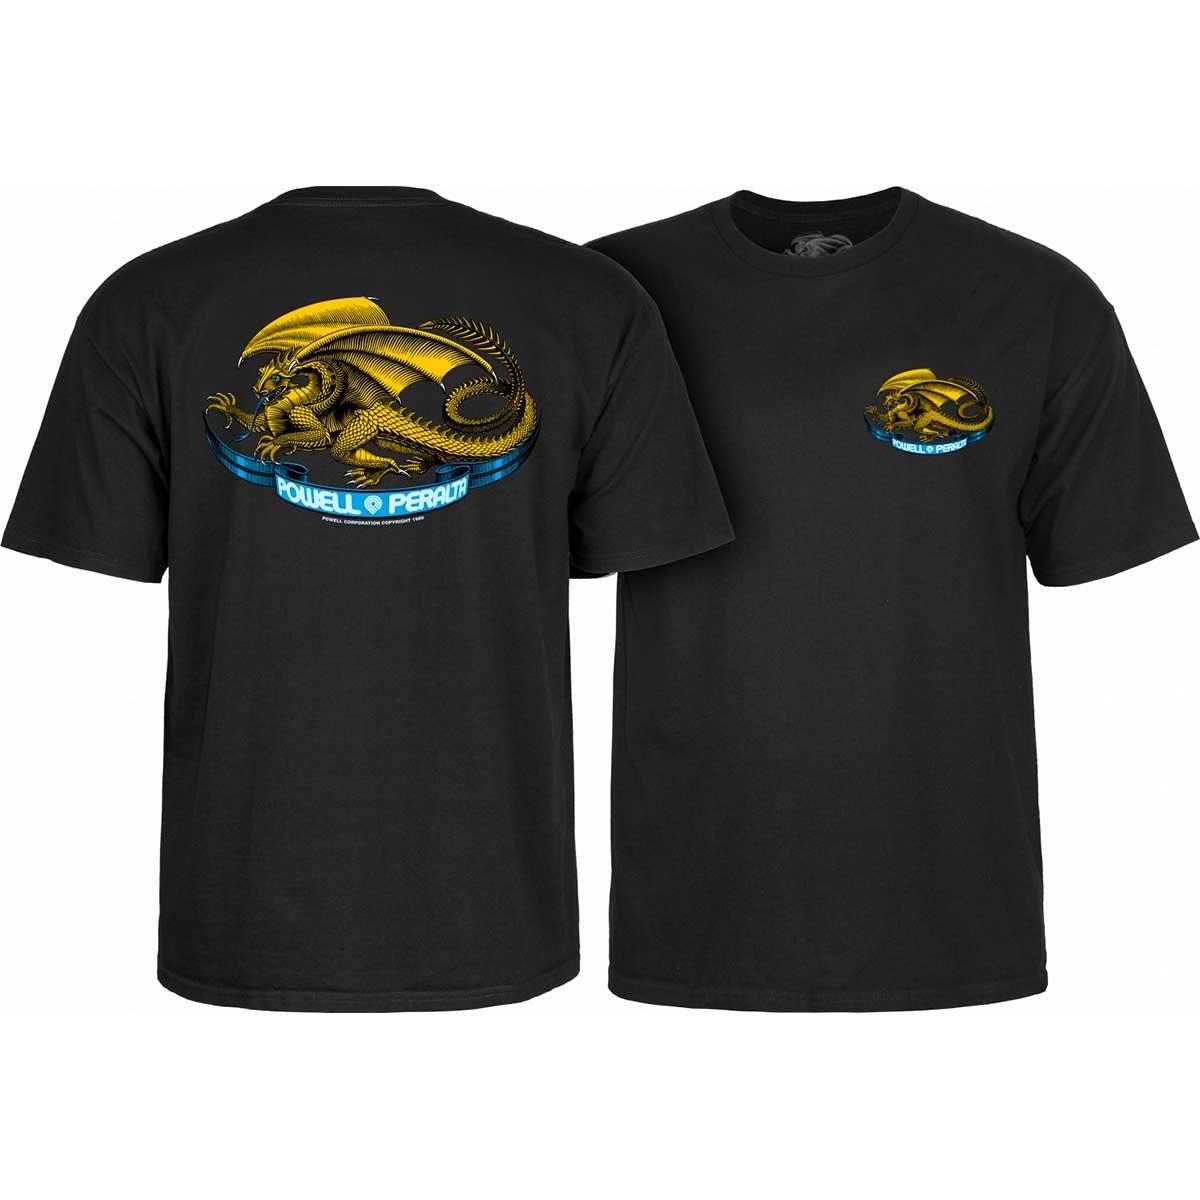 Powell Peralta Oval Dragon T-Shirt MEDIUM Powder Blue Size